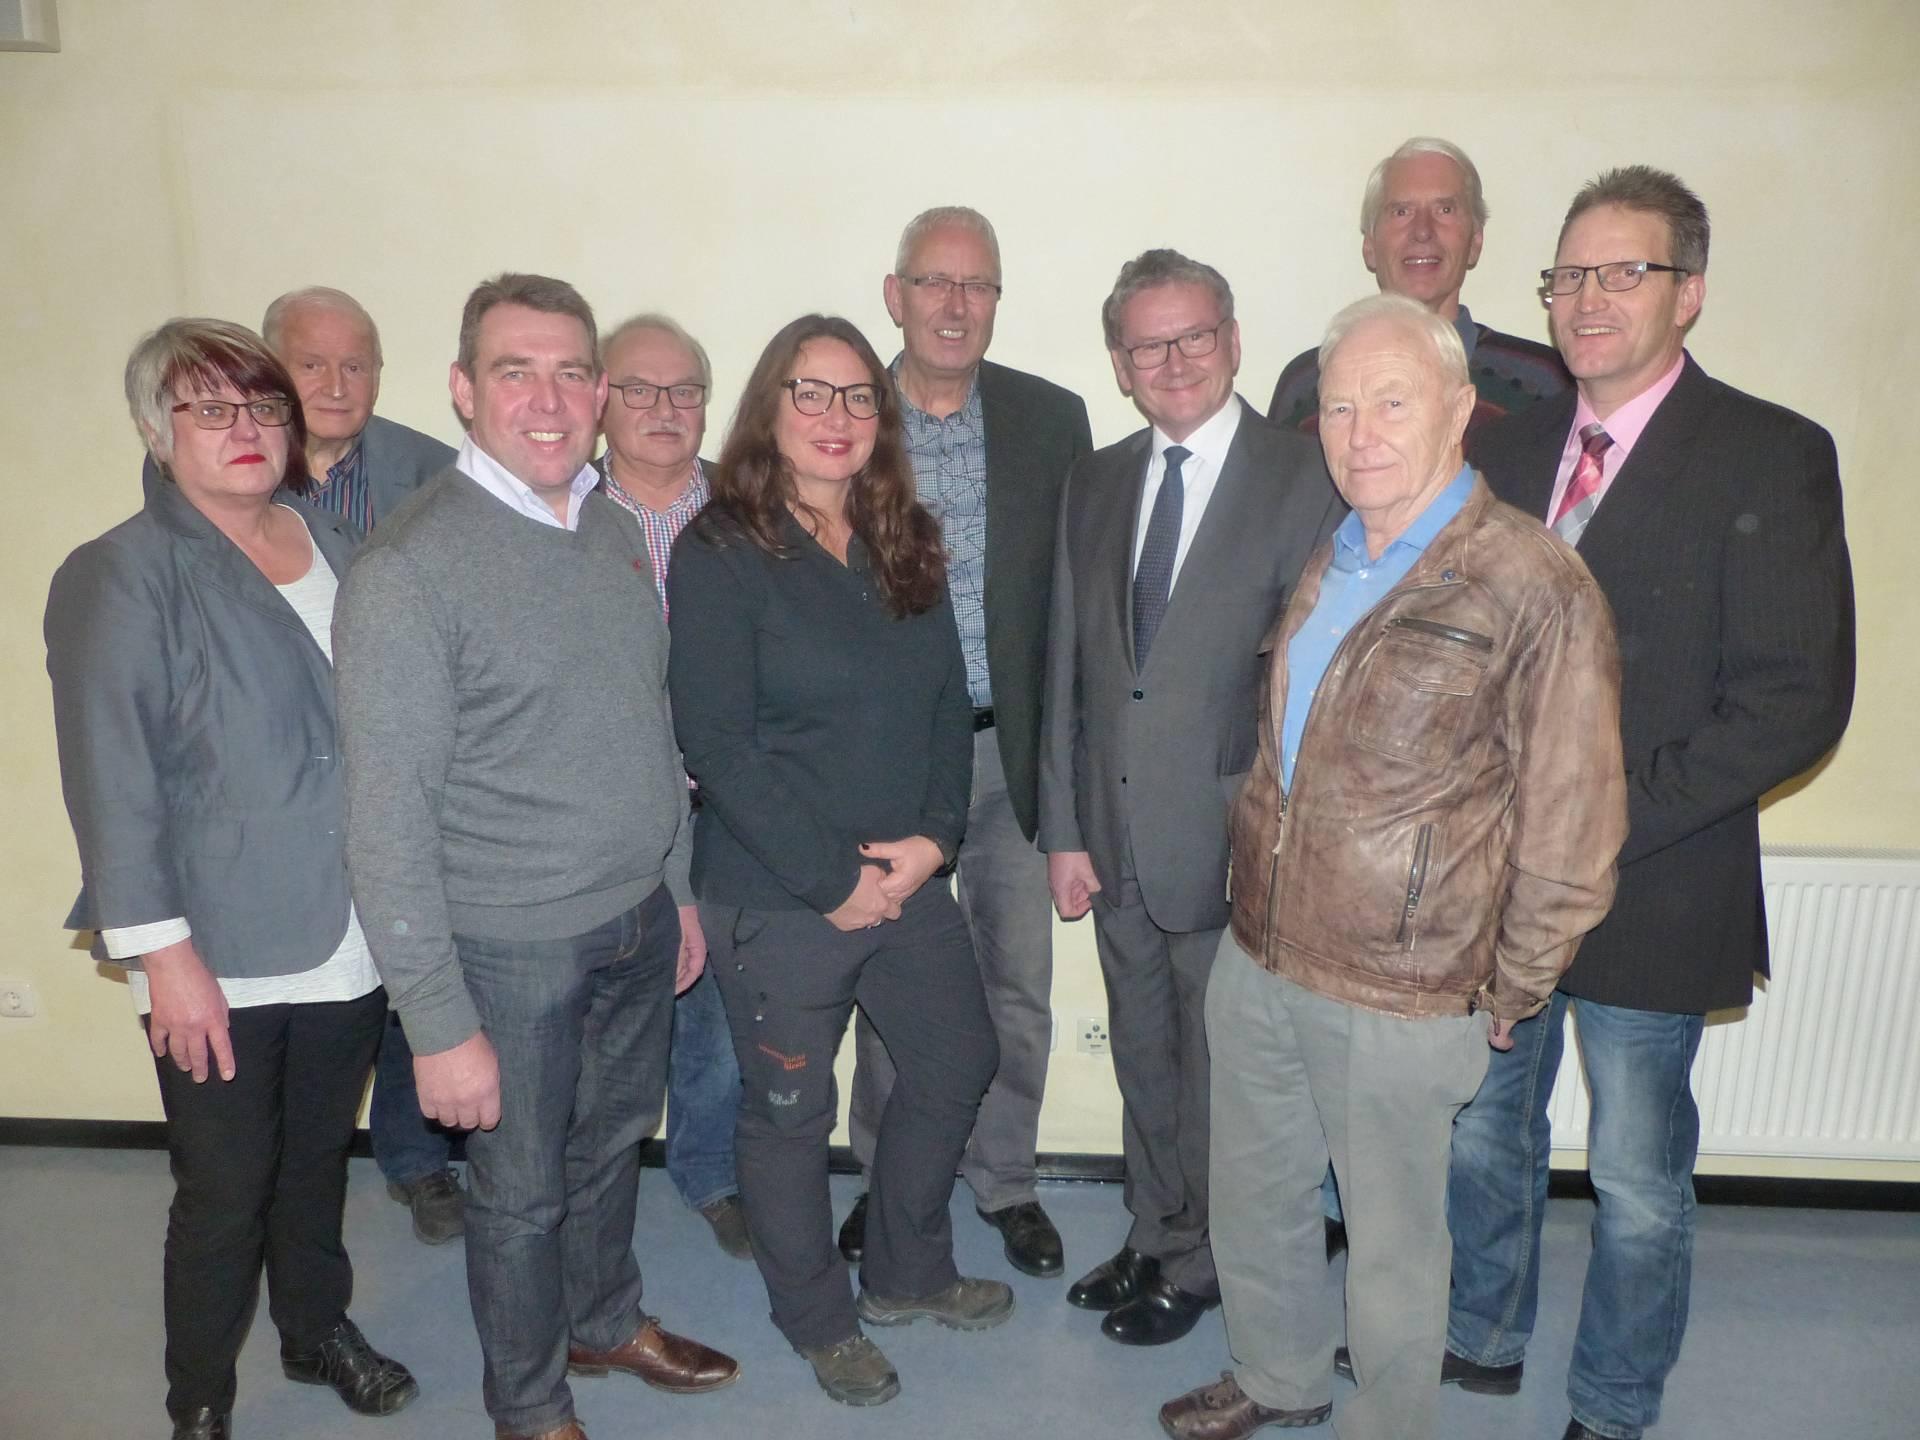 Auf dem Foto sieht man v.l.n.r. Beate Carl, Herbert Jordan, Rüdiger Käckel, Otto Dörigmann, Andrea Kühne, Friedbert Kanne, Landrat Uwe Schmidt, Erwin Möller, Dieter Meyer und Karsten Bock.